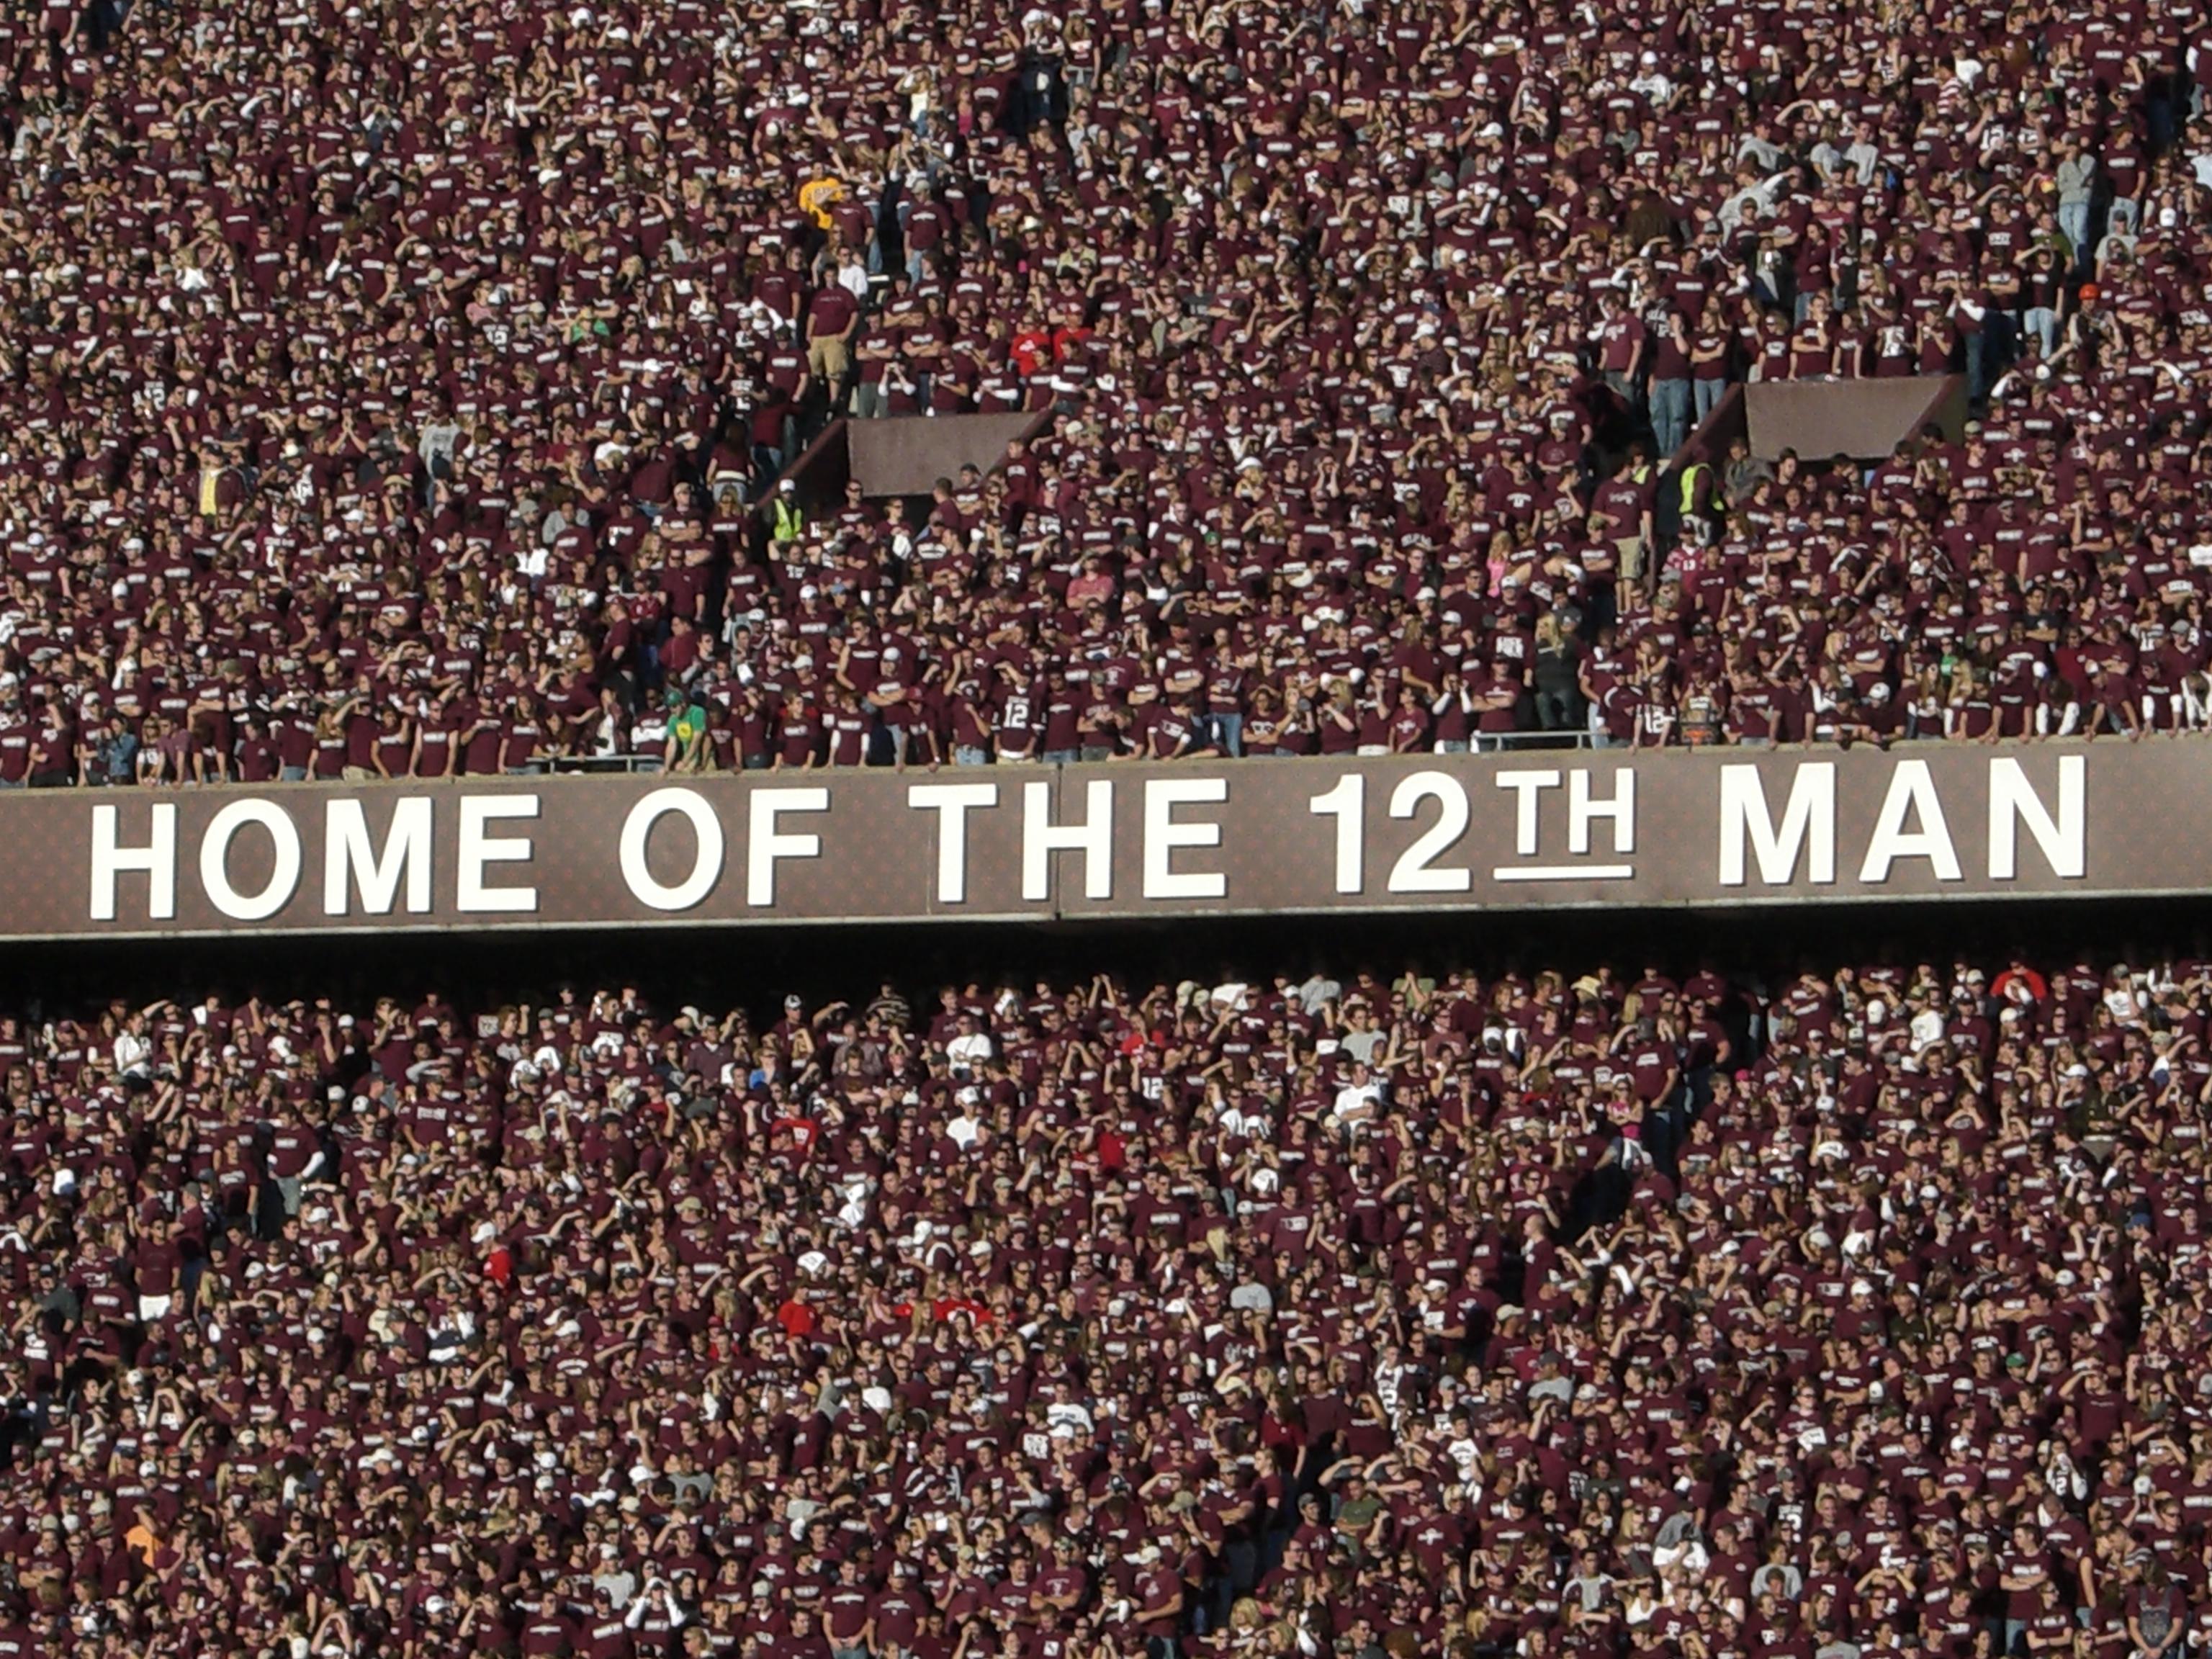 Texas a m background image - File 12th Man Trademark Slogan At Kyle Field Texas A M Jpg